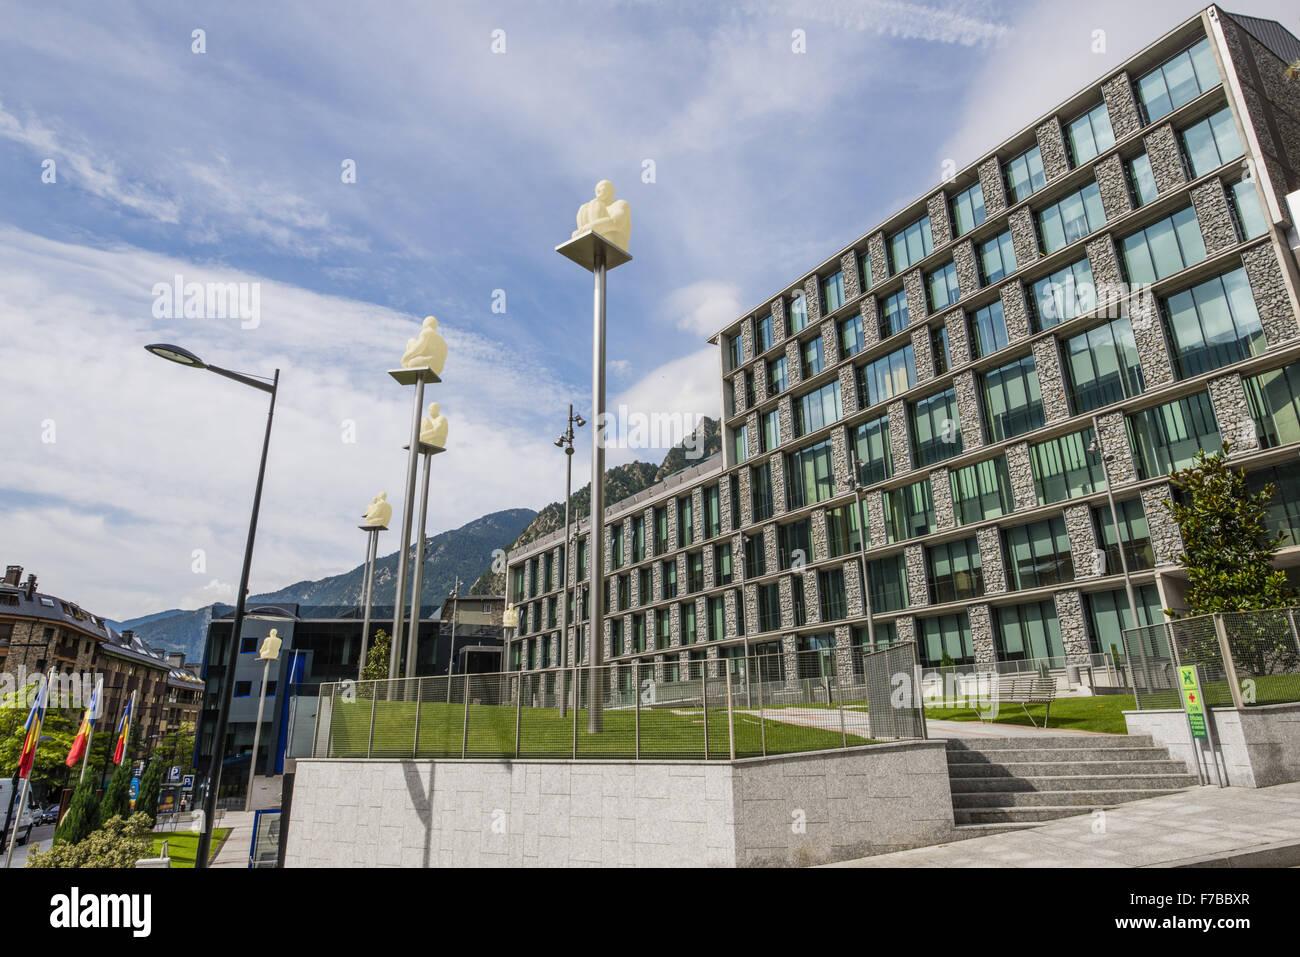 Consell General, Andorra la Vella, capital city of Andorra, Andorra - Stock Image